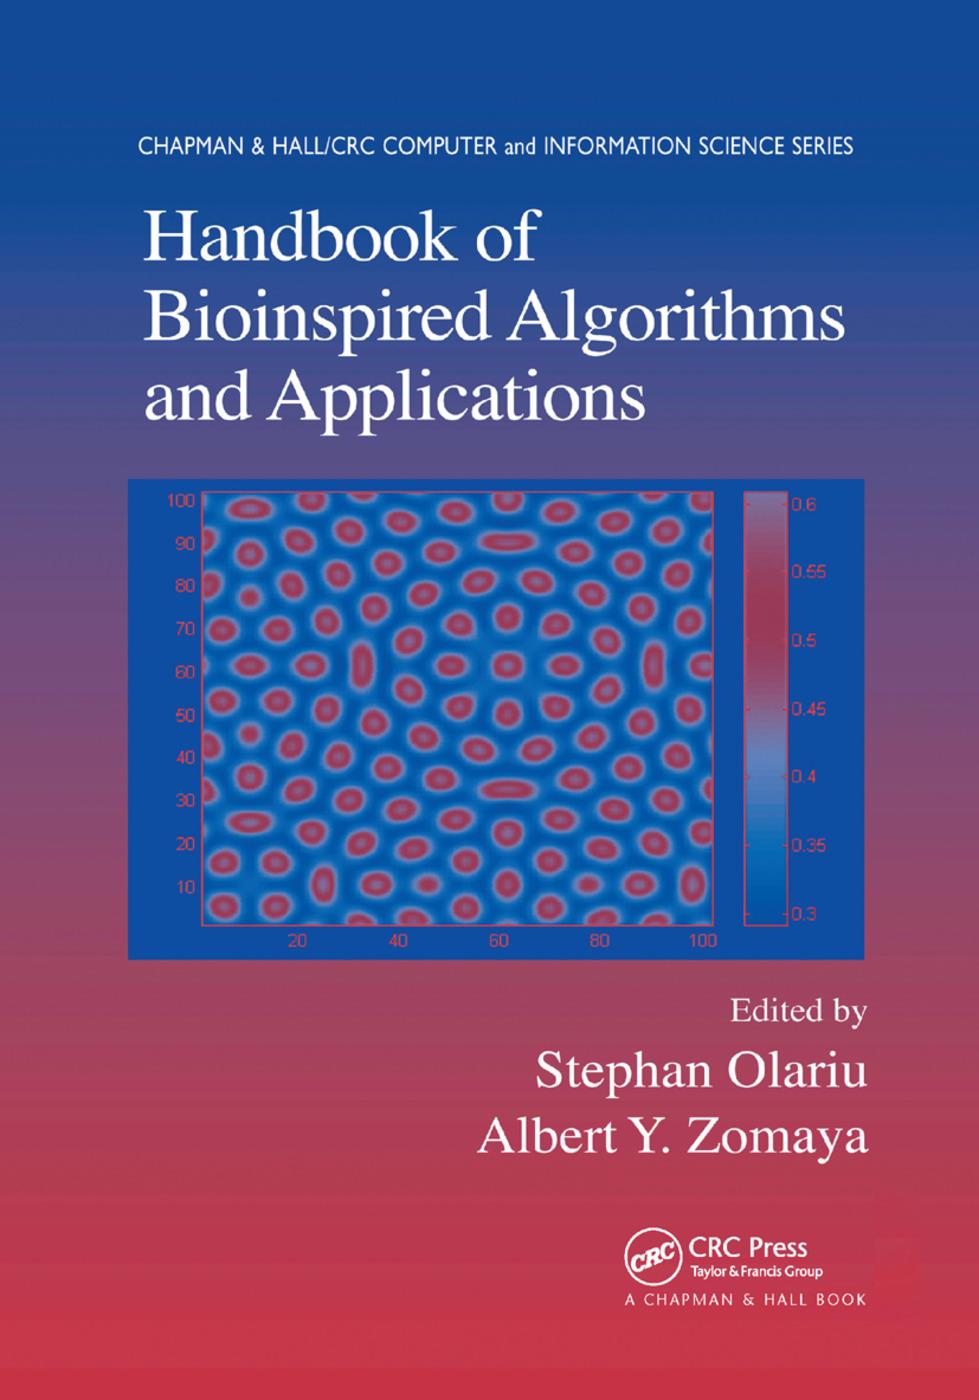 Handbook of Bioinspired Algorithms and Applications